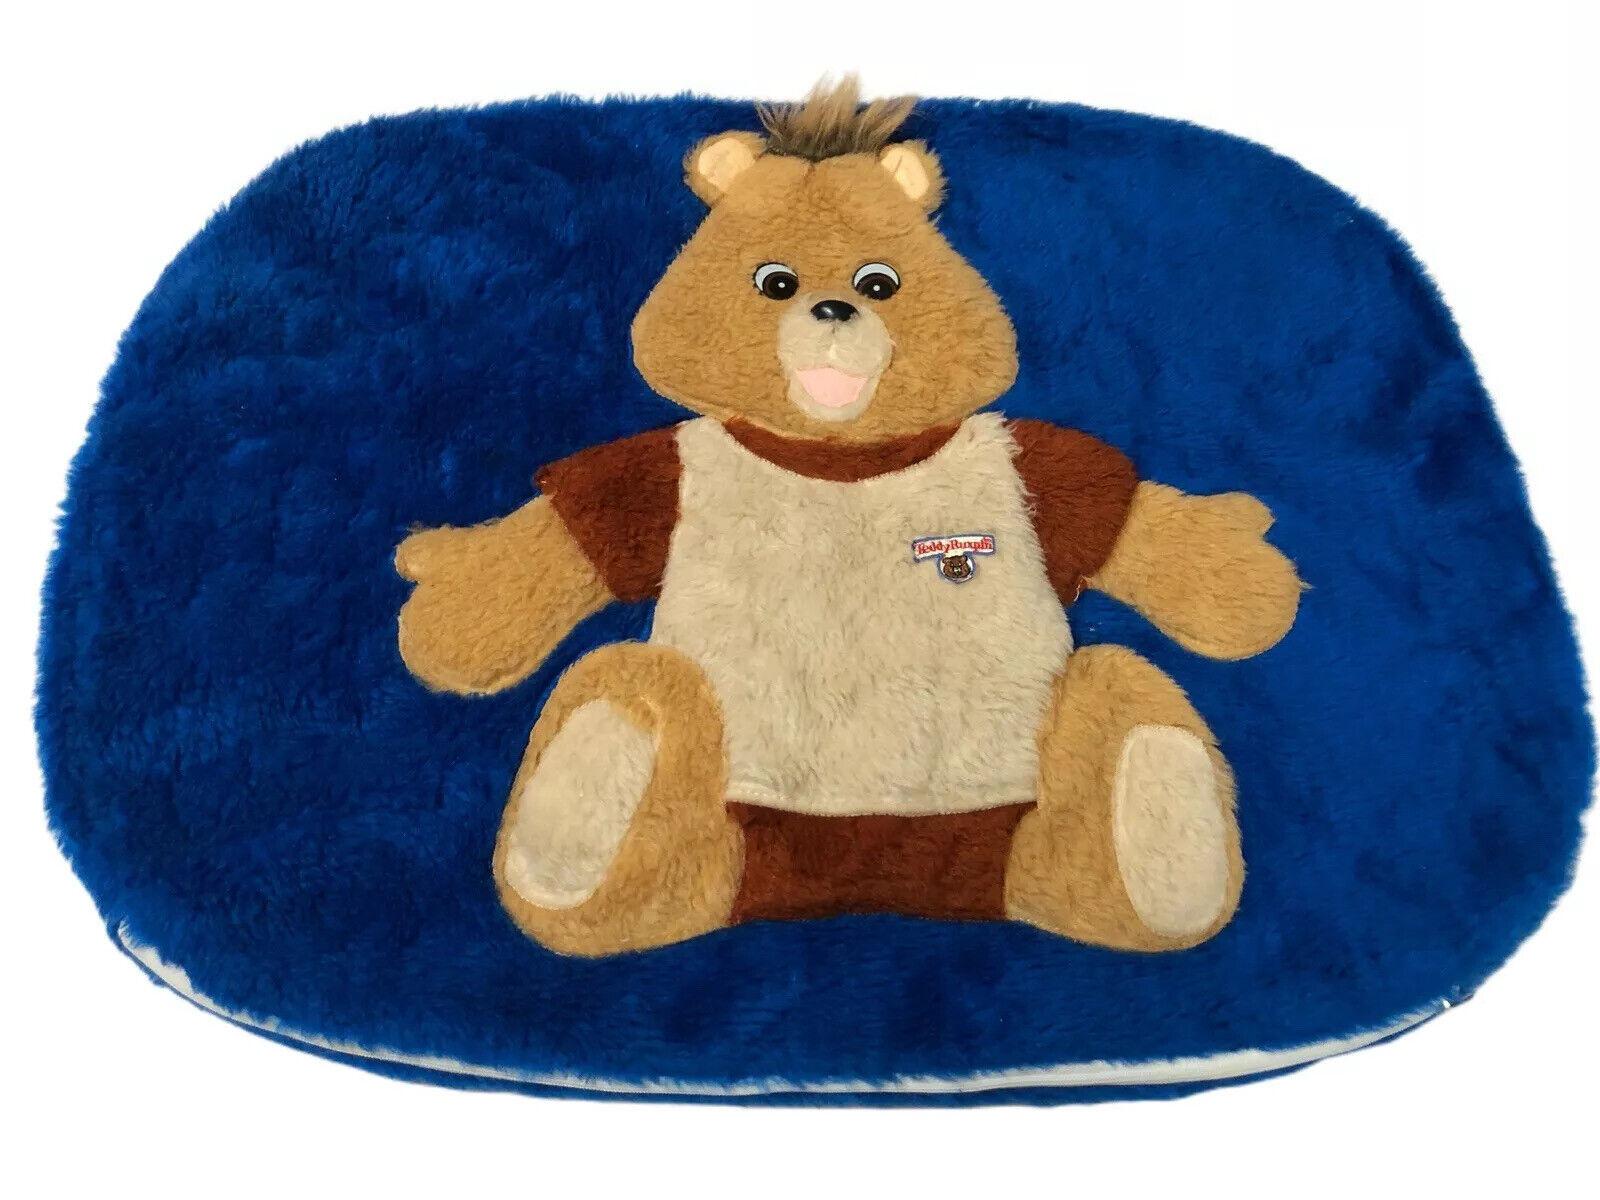 Vintage 80s Teddy Ruxpin Plush Pillowcase Cover - Very Rare HTF